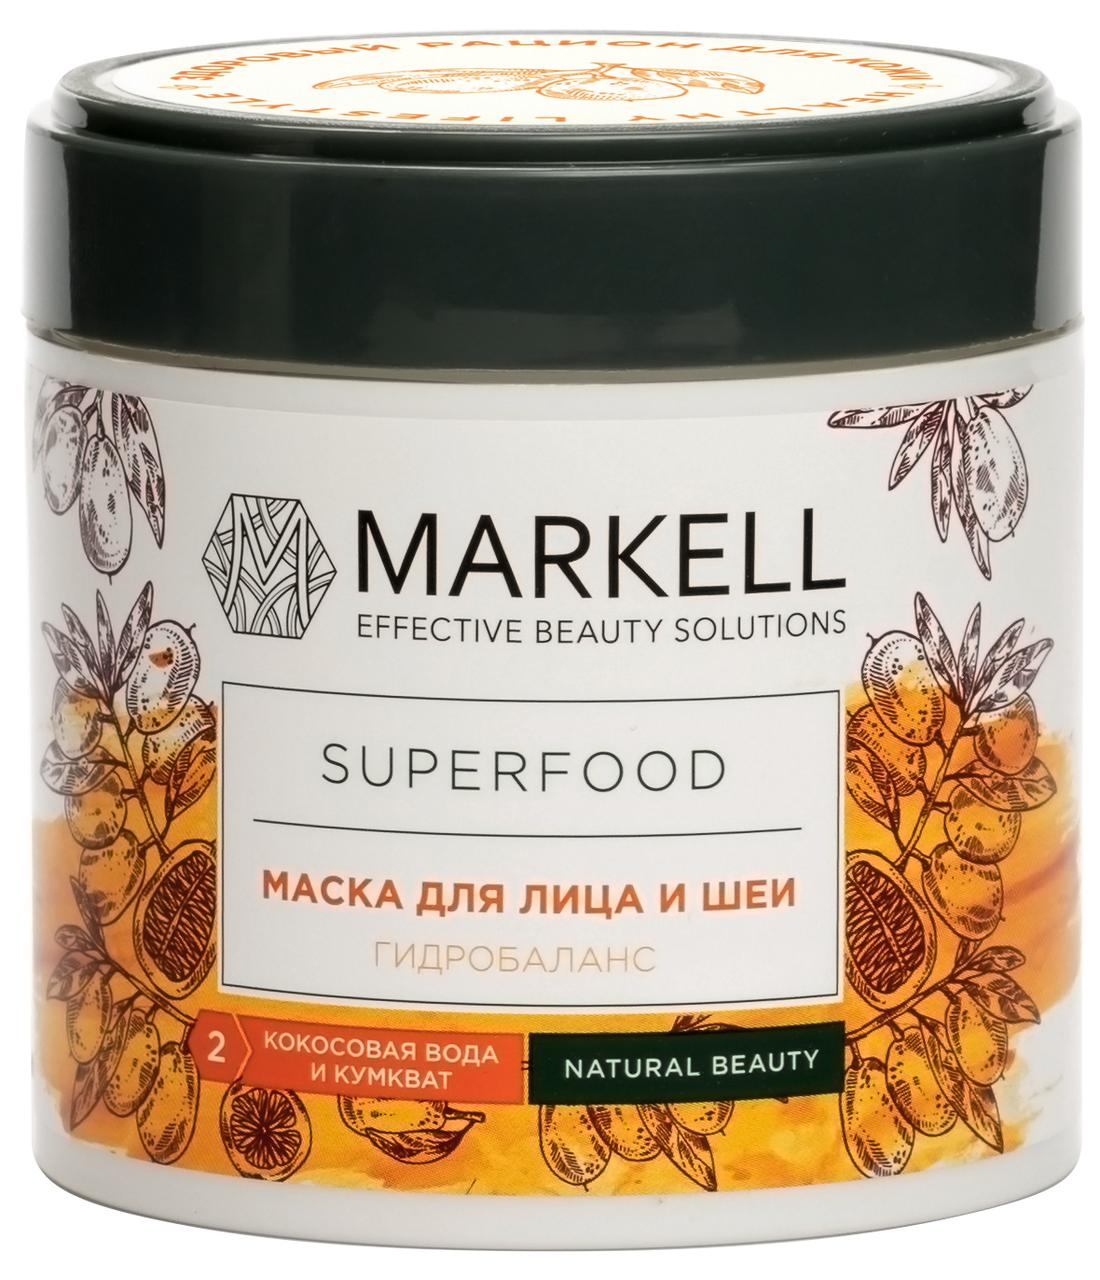 Маска для лица и шеи гидробаланс кокосовая вода и кумкват Markell SuperFood 100 мл (4810304017132)